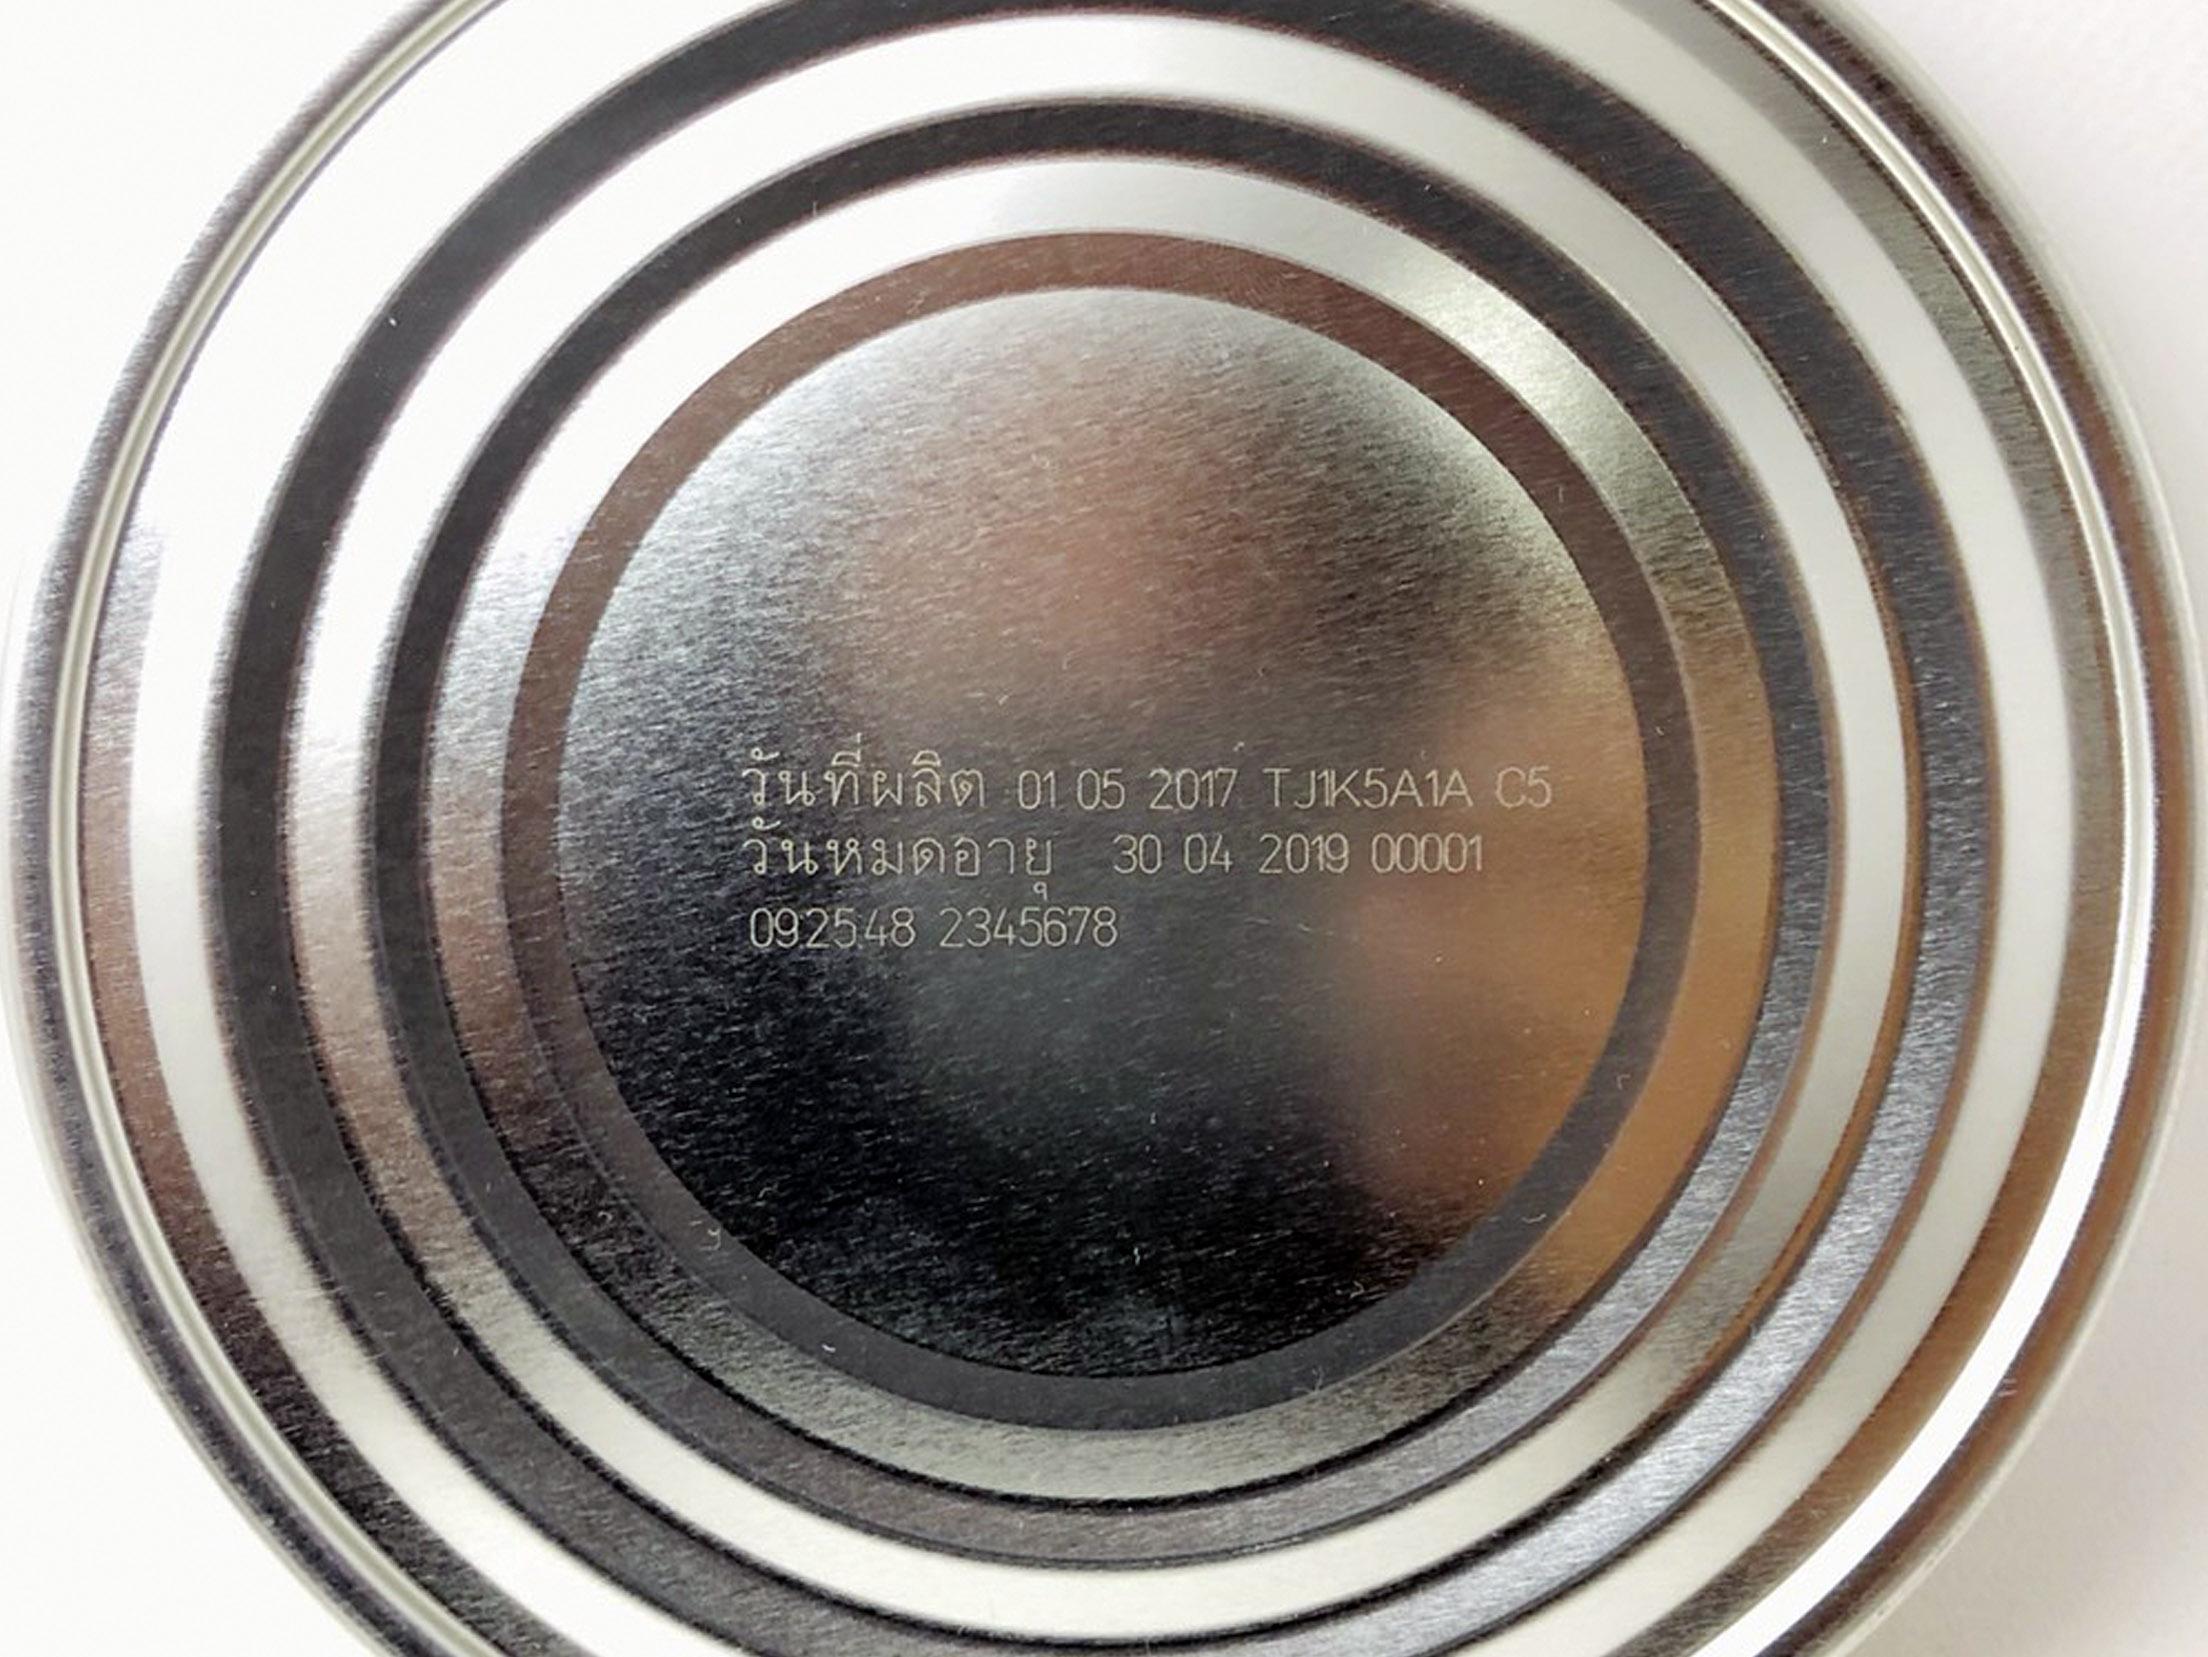 Fiber laser marking soltuion on metal li